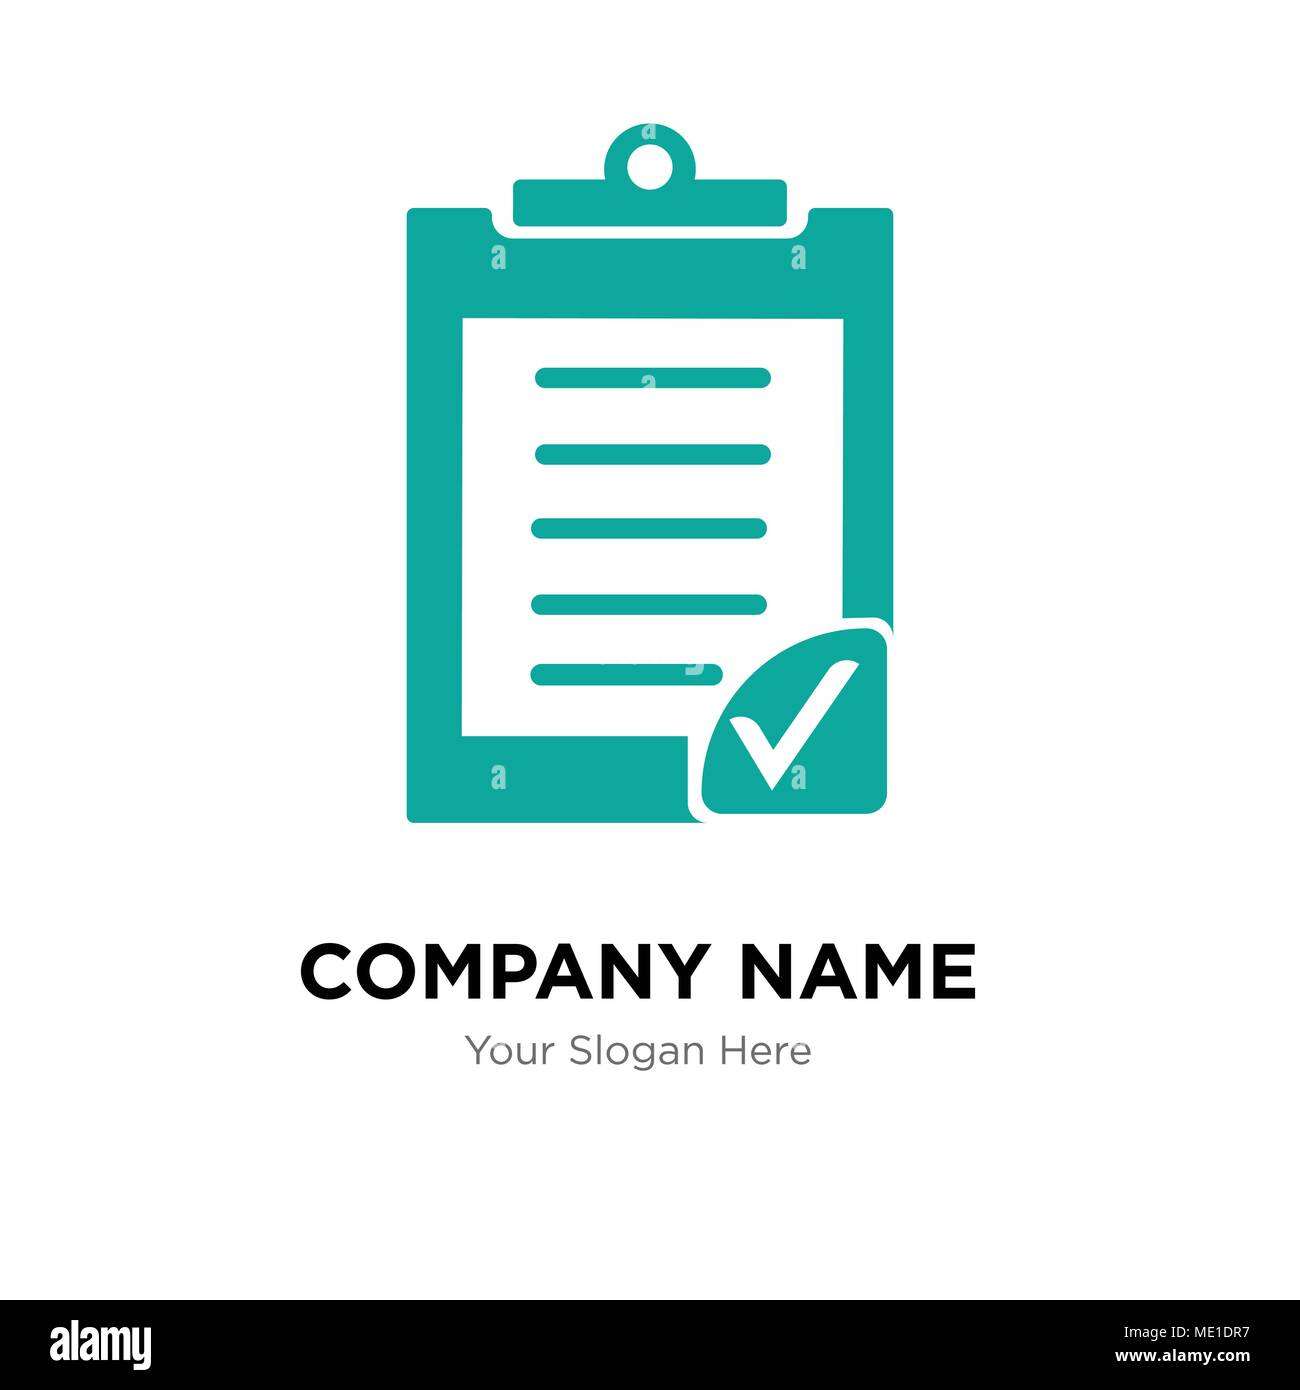 clipboard verification company logo design template business